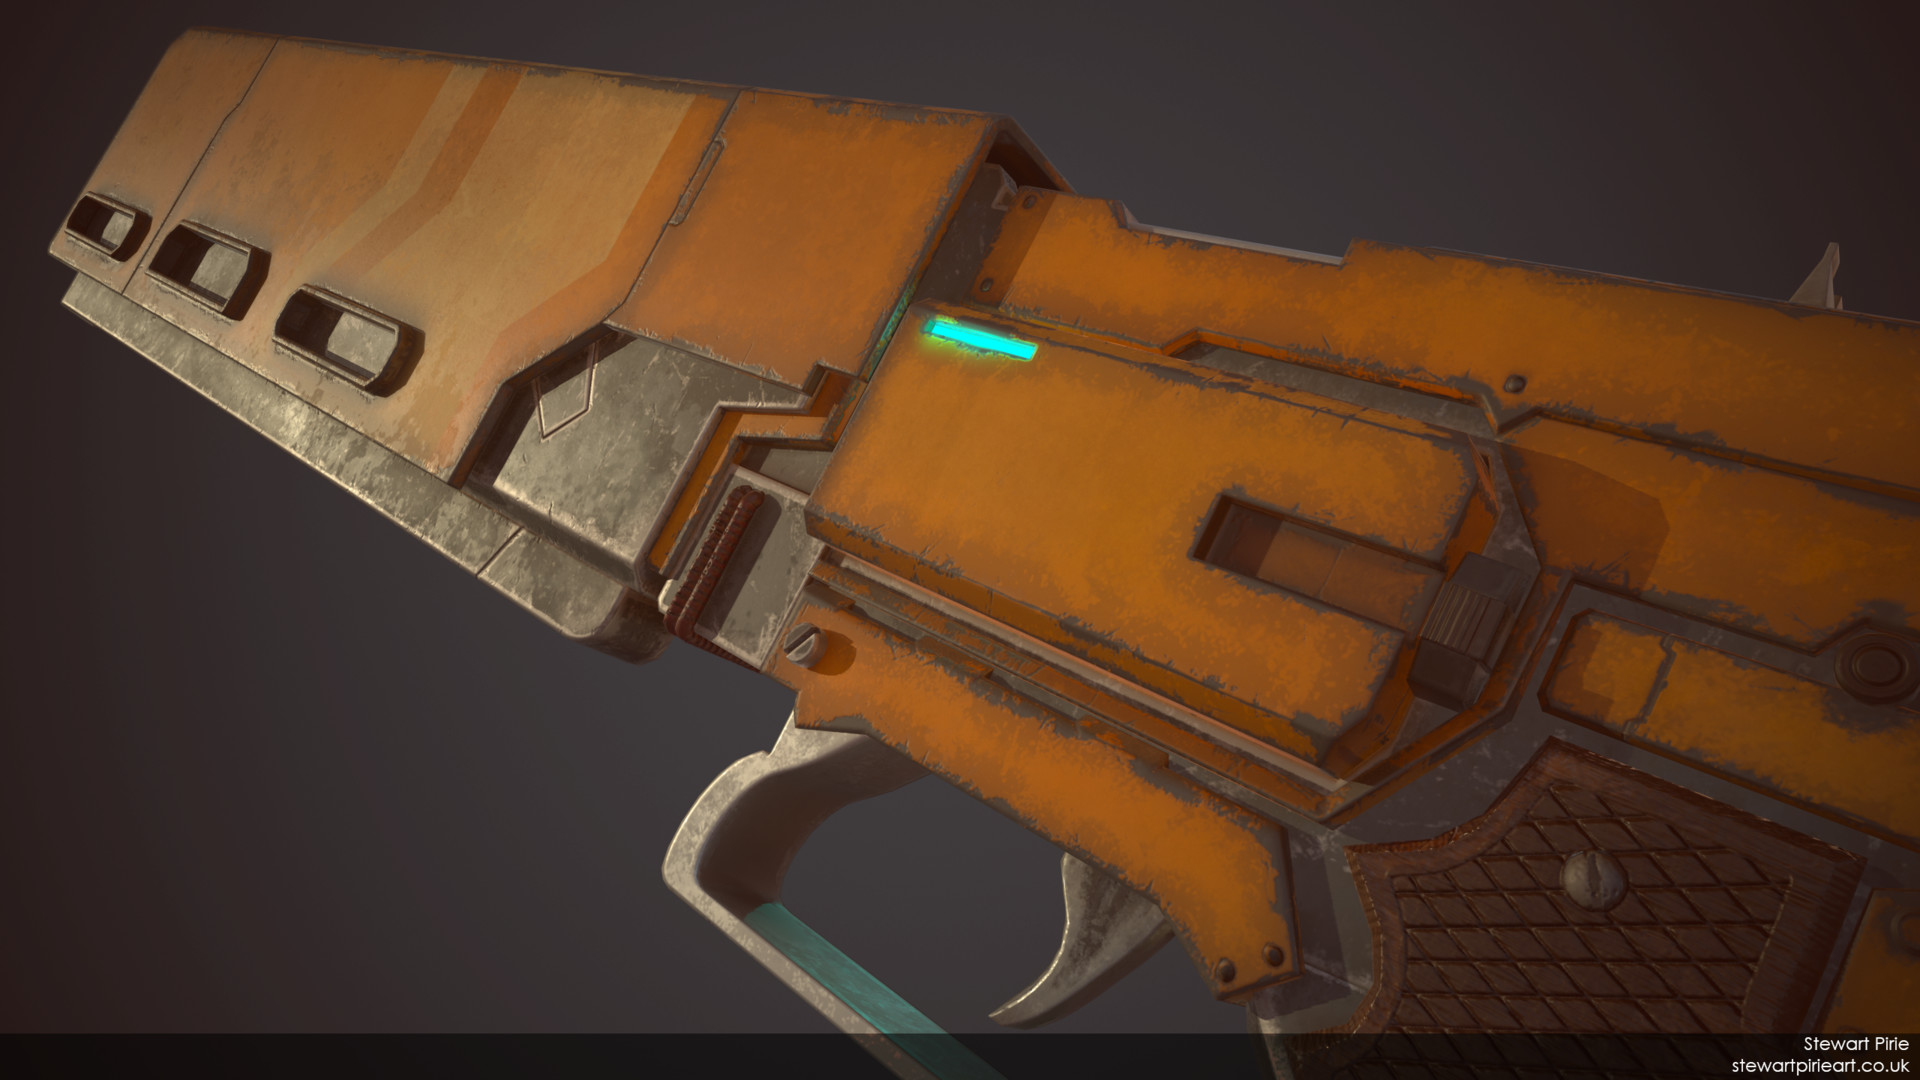 Stewart pirie gun shot 04